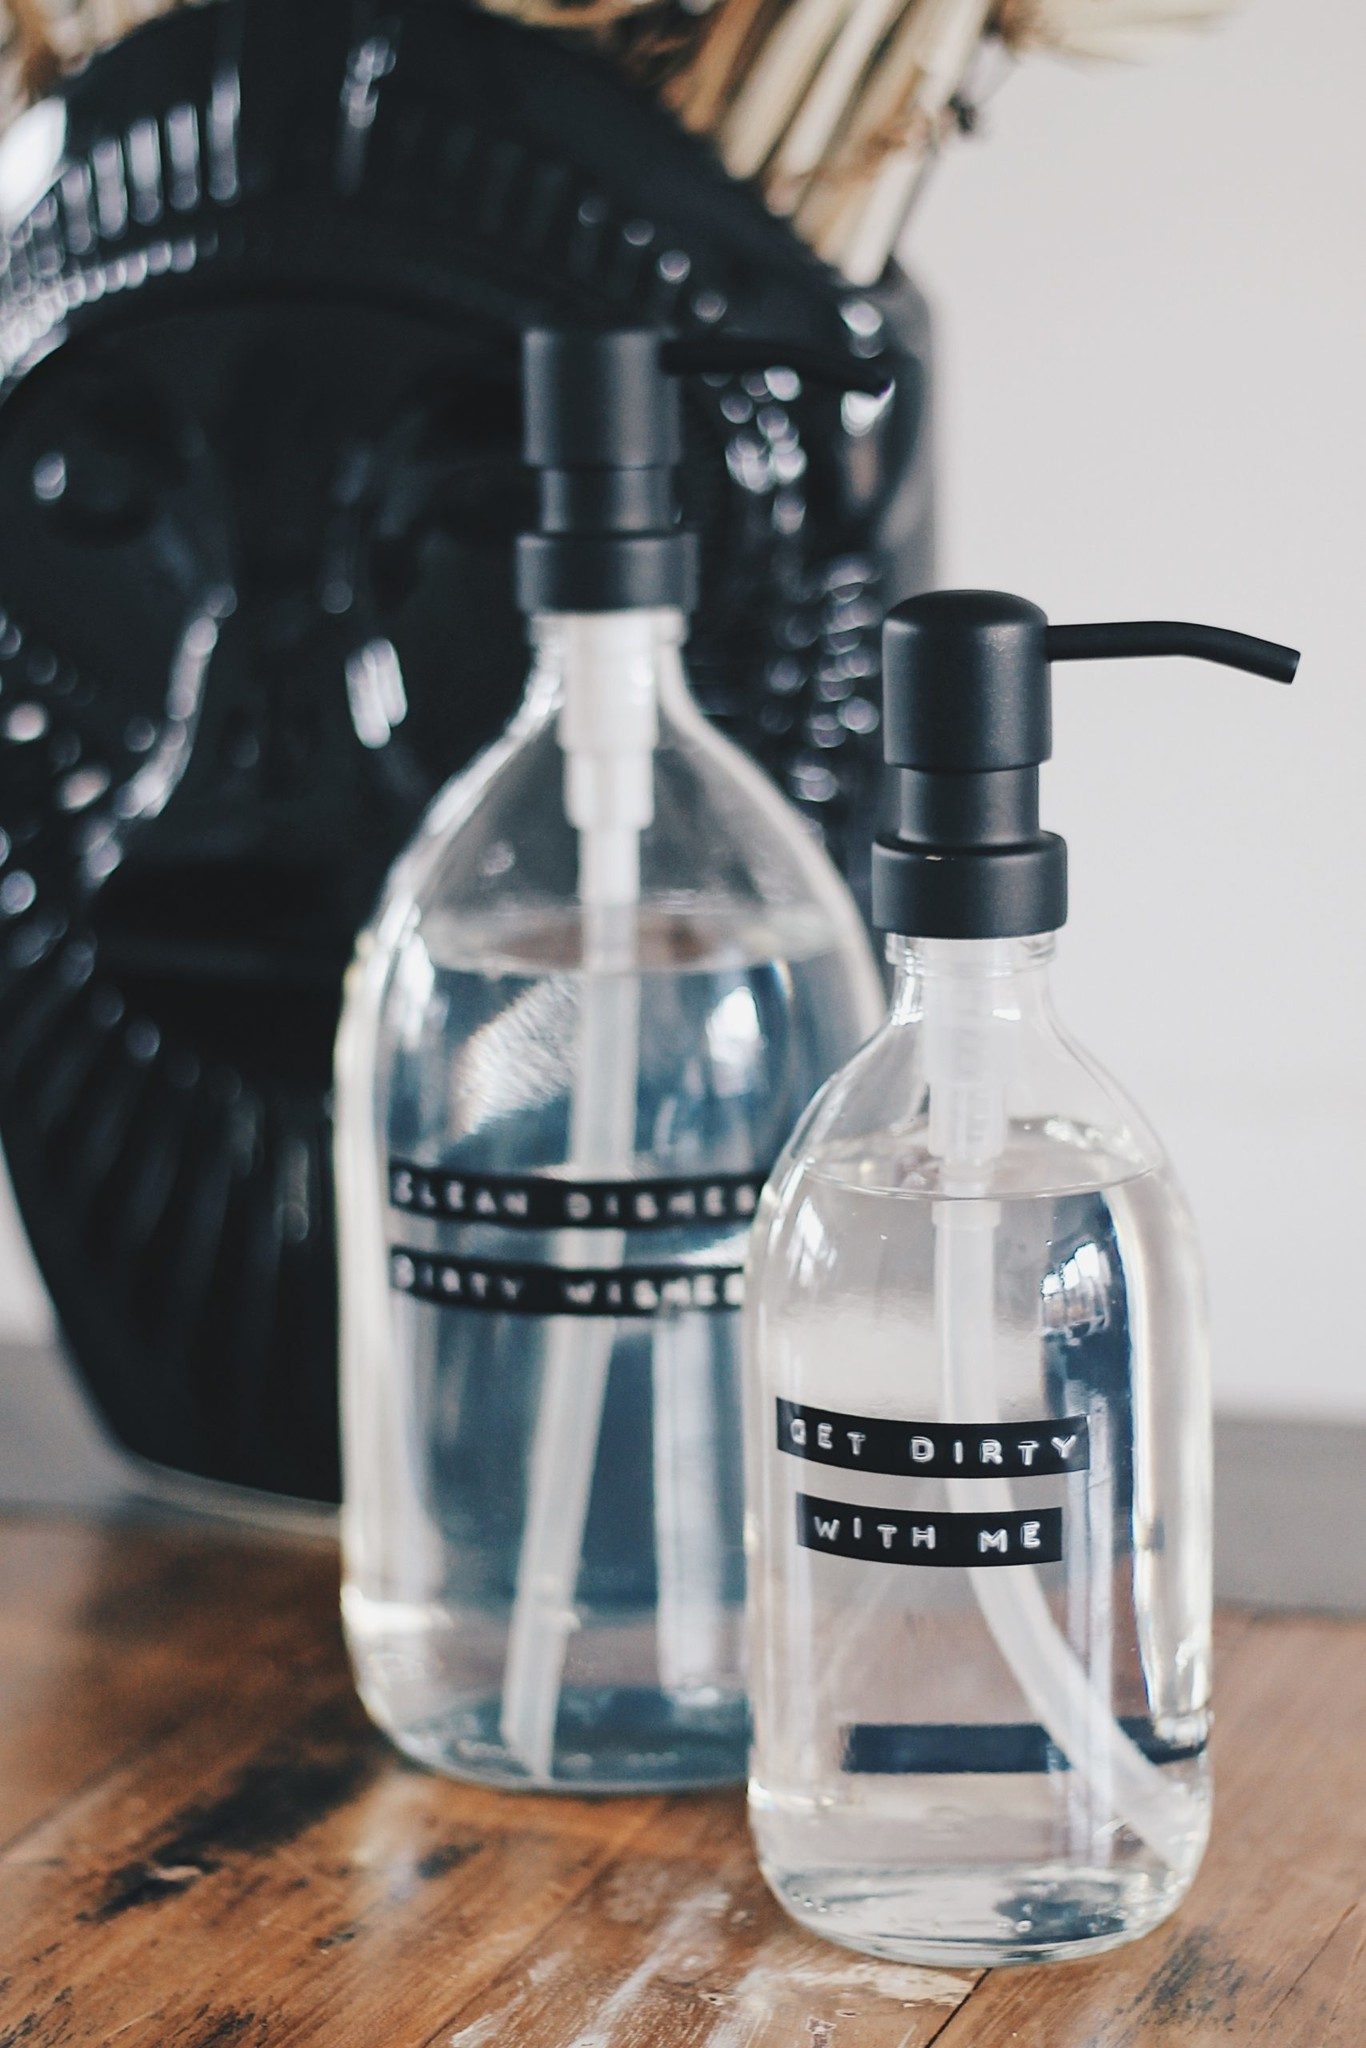 Afwasmiddel helder glas - zwart - 1L 'Dish soap'-2